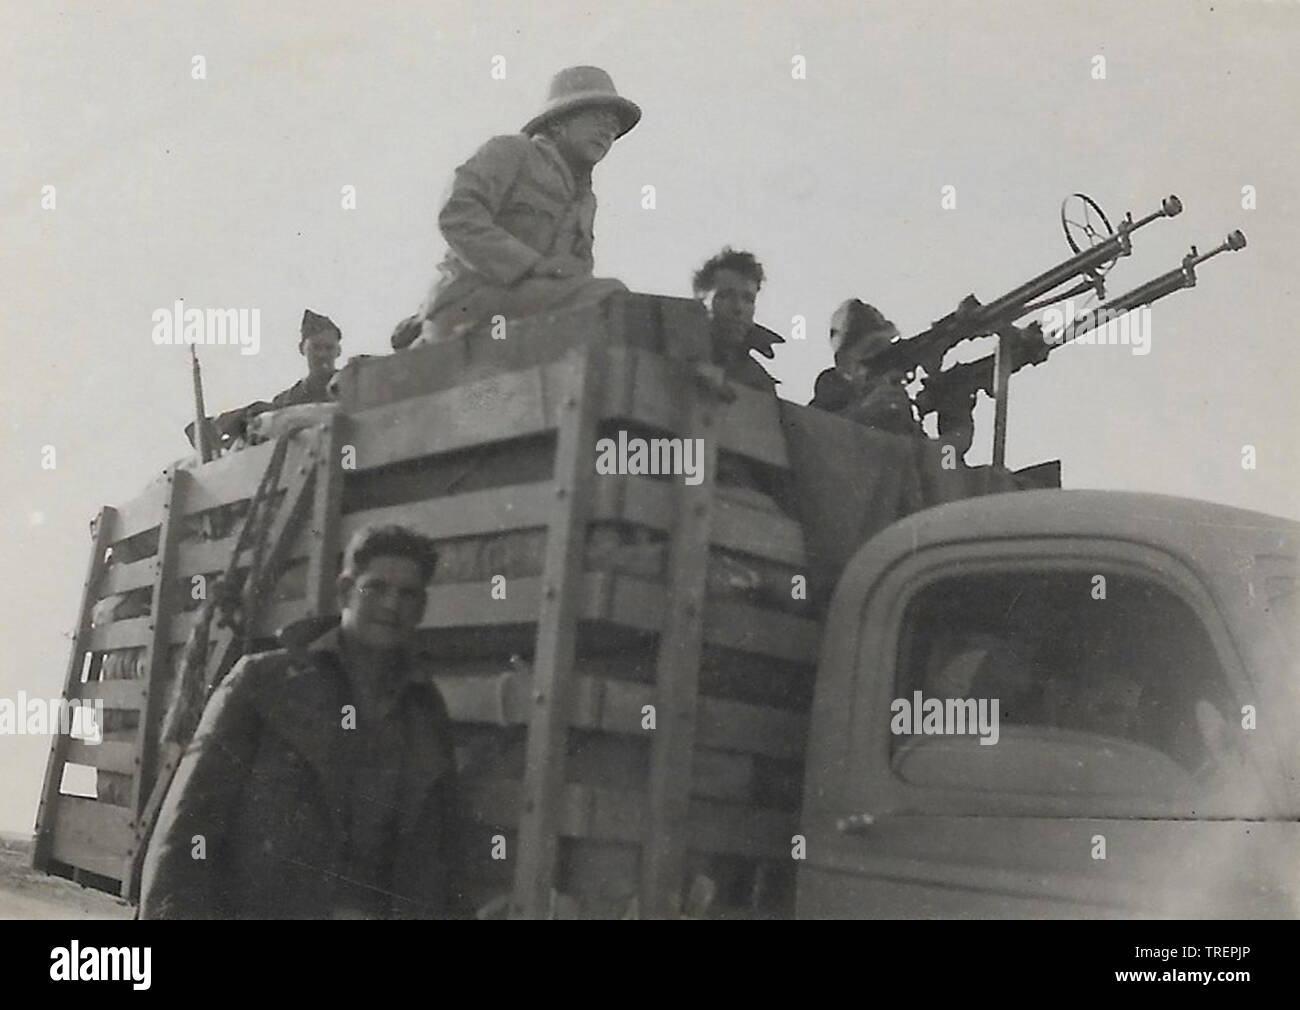 Convoi désert occidental. Prises en 1943/44 par Flt Sgt Gleed RAF WW2, de l'Escadron 223 Photo Stock